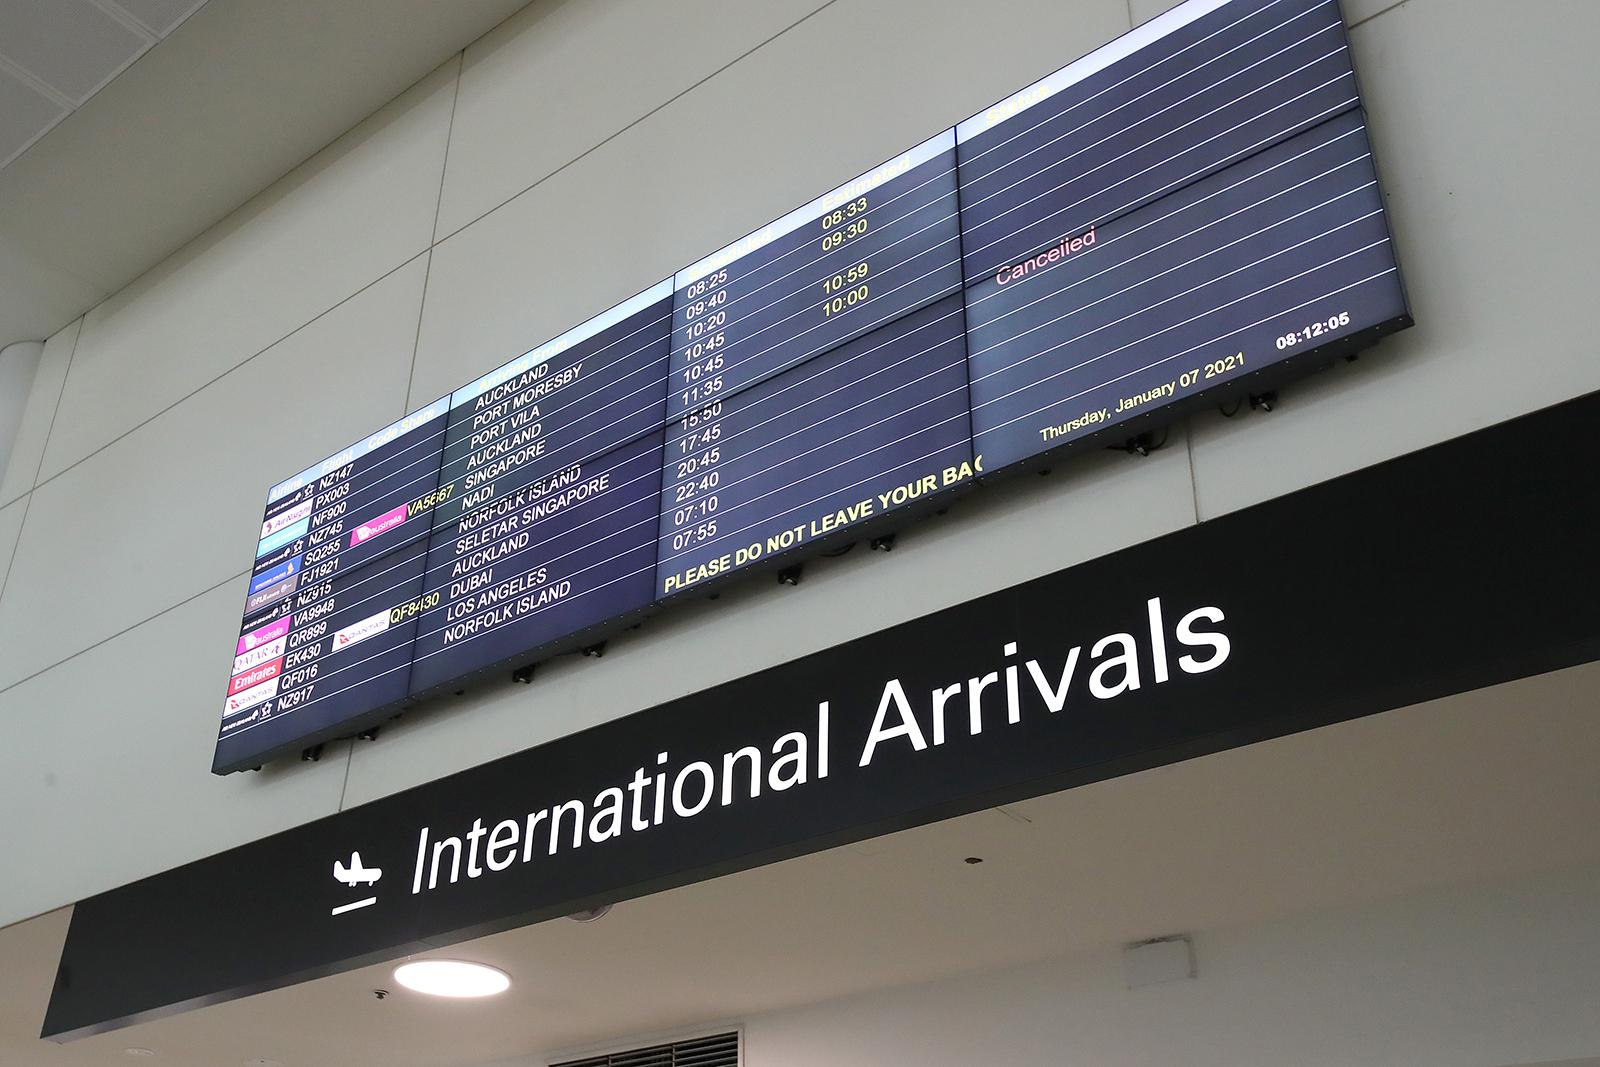 A digital screen displays flight arrival times at Brisbane Airport on January 7, in Brisbane, Australia.